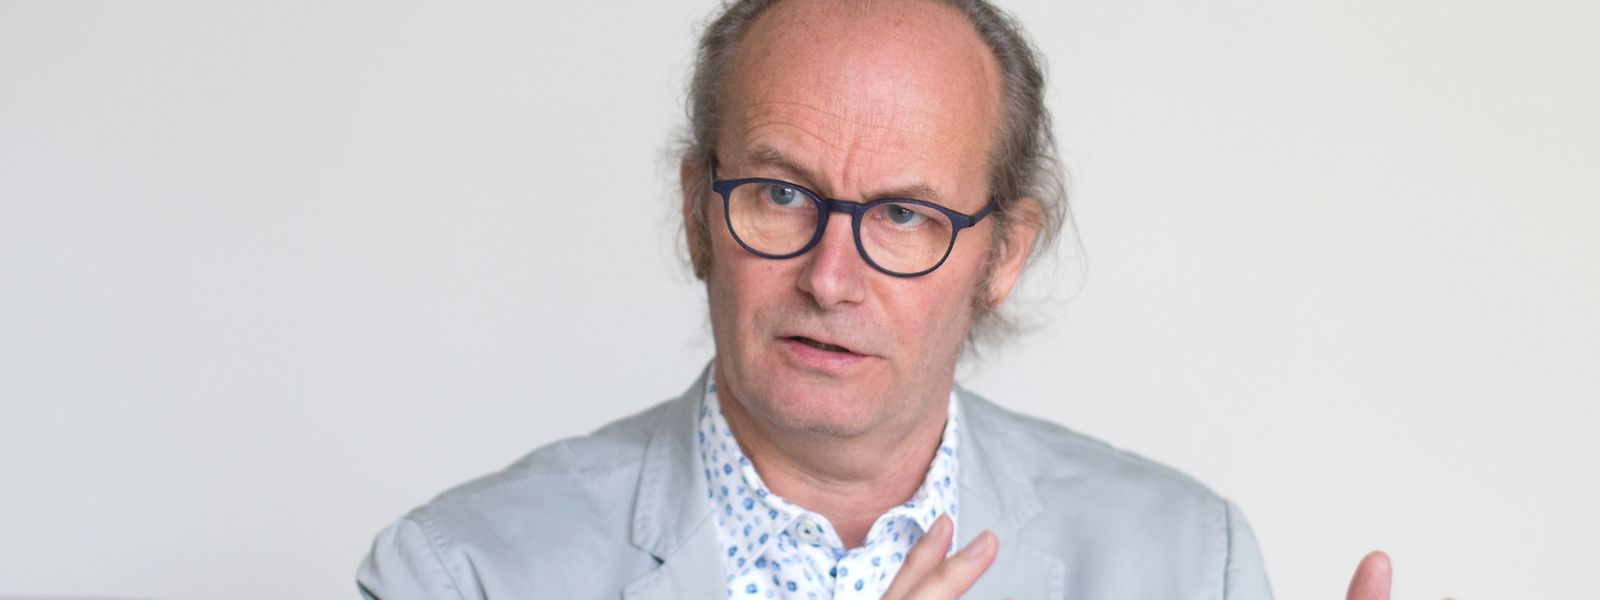 Claude Turmes: Viel Freude am Europaparlament, mehr Gestaltungsspielraum in der EU-Kommission.